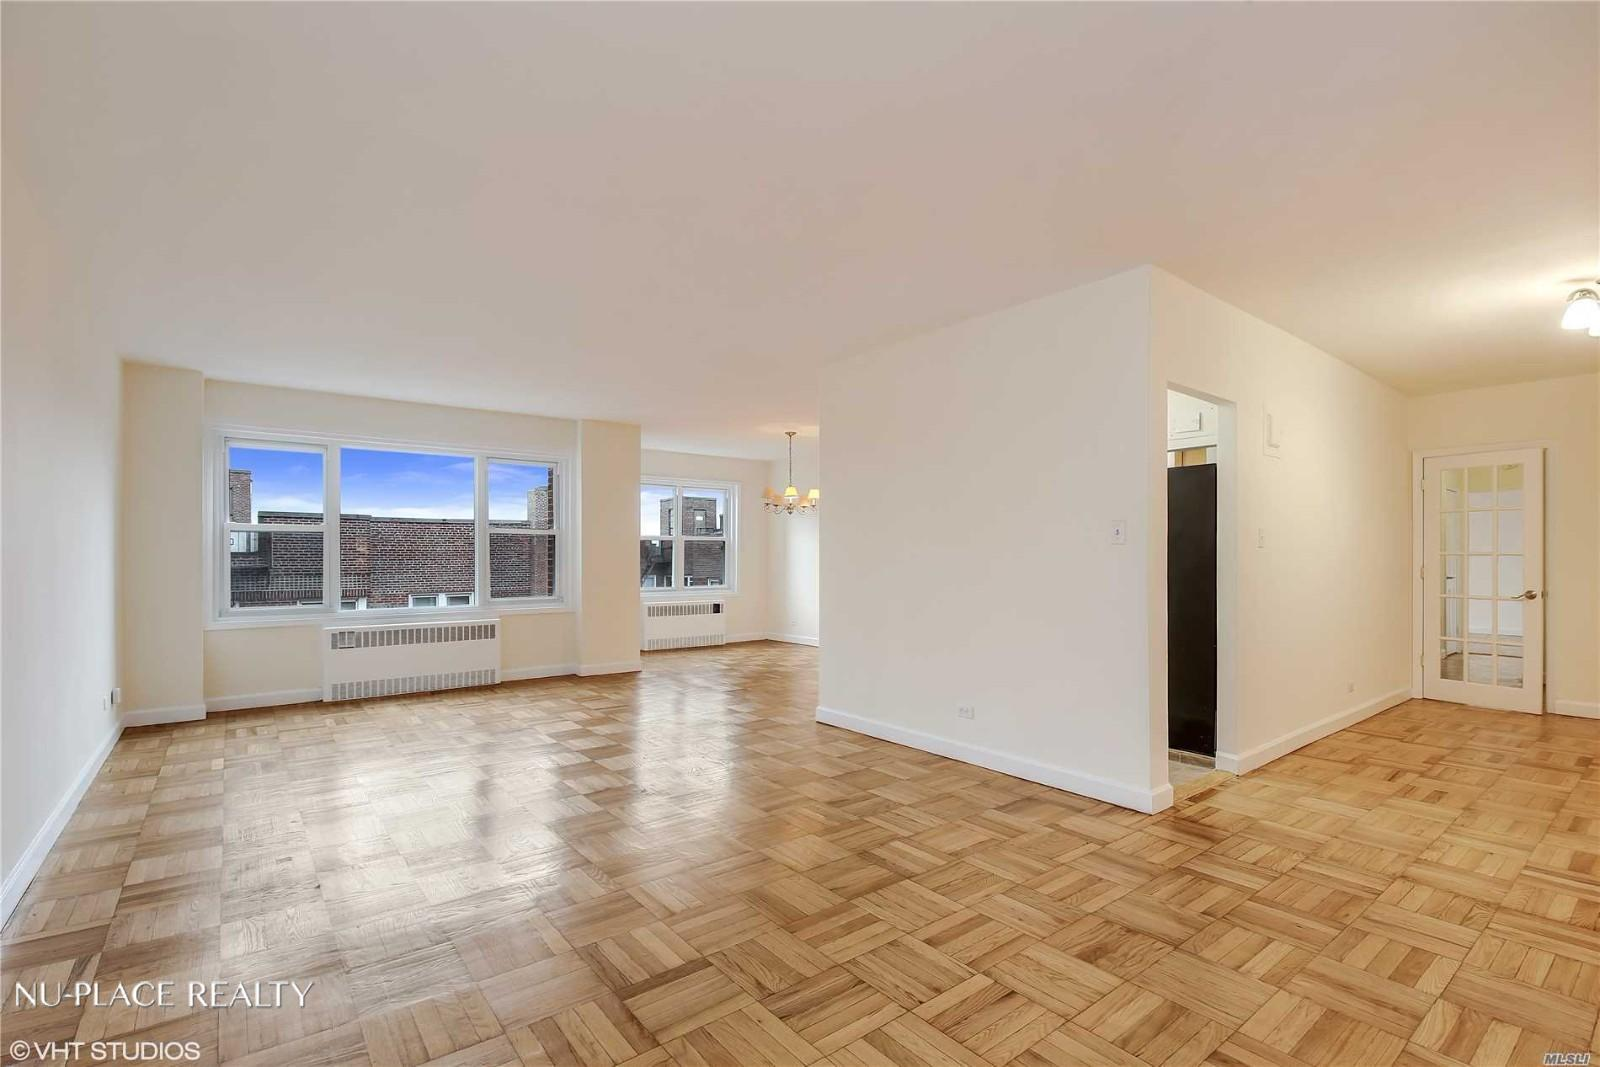 110 45 Queens Blvd 710 Forest Hills Ny 11375 Forest Hills Coops Forest Hills 3 Bedroom Coop For Sale